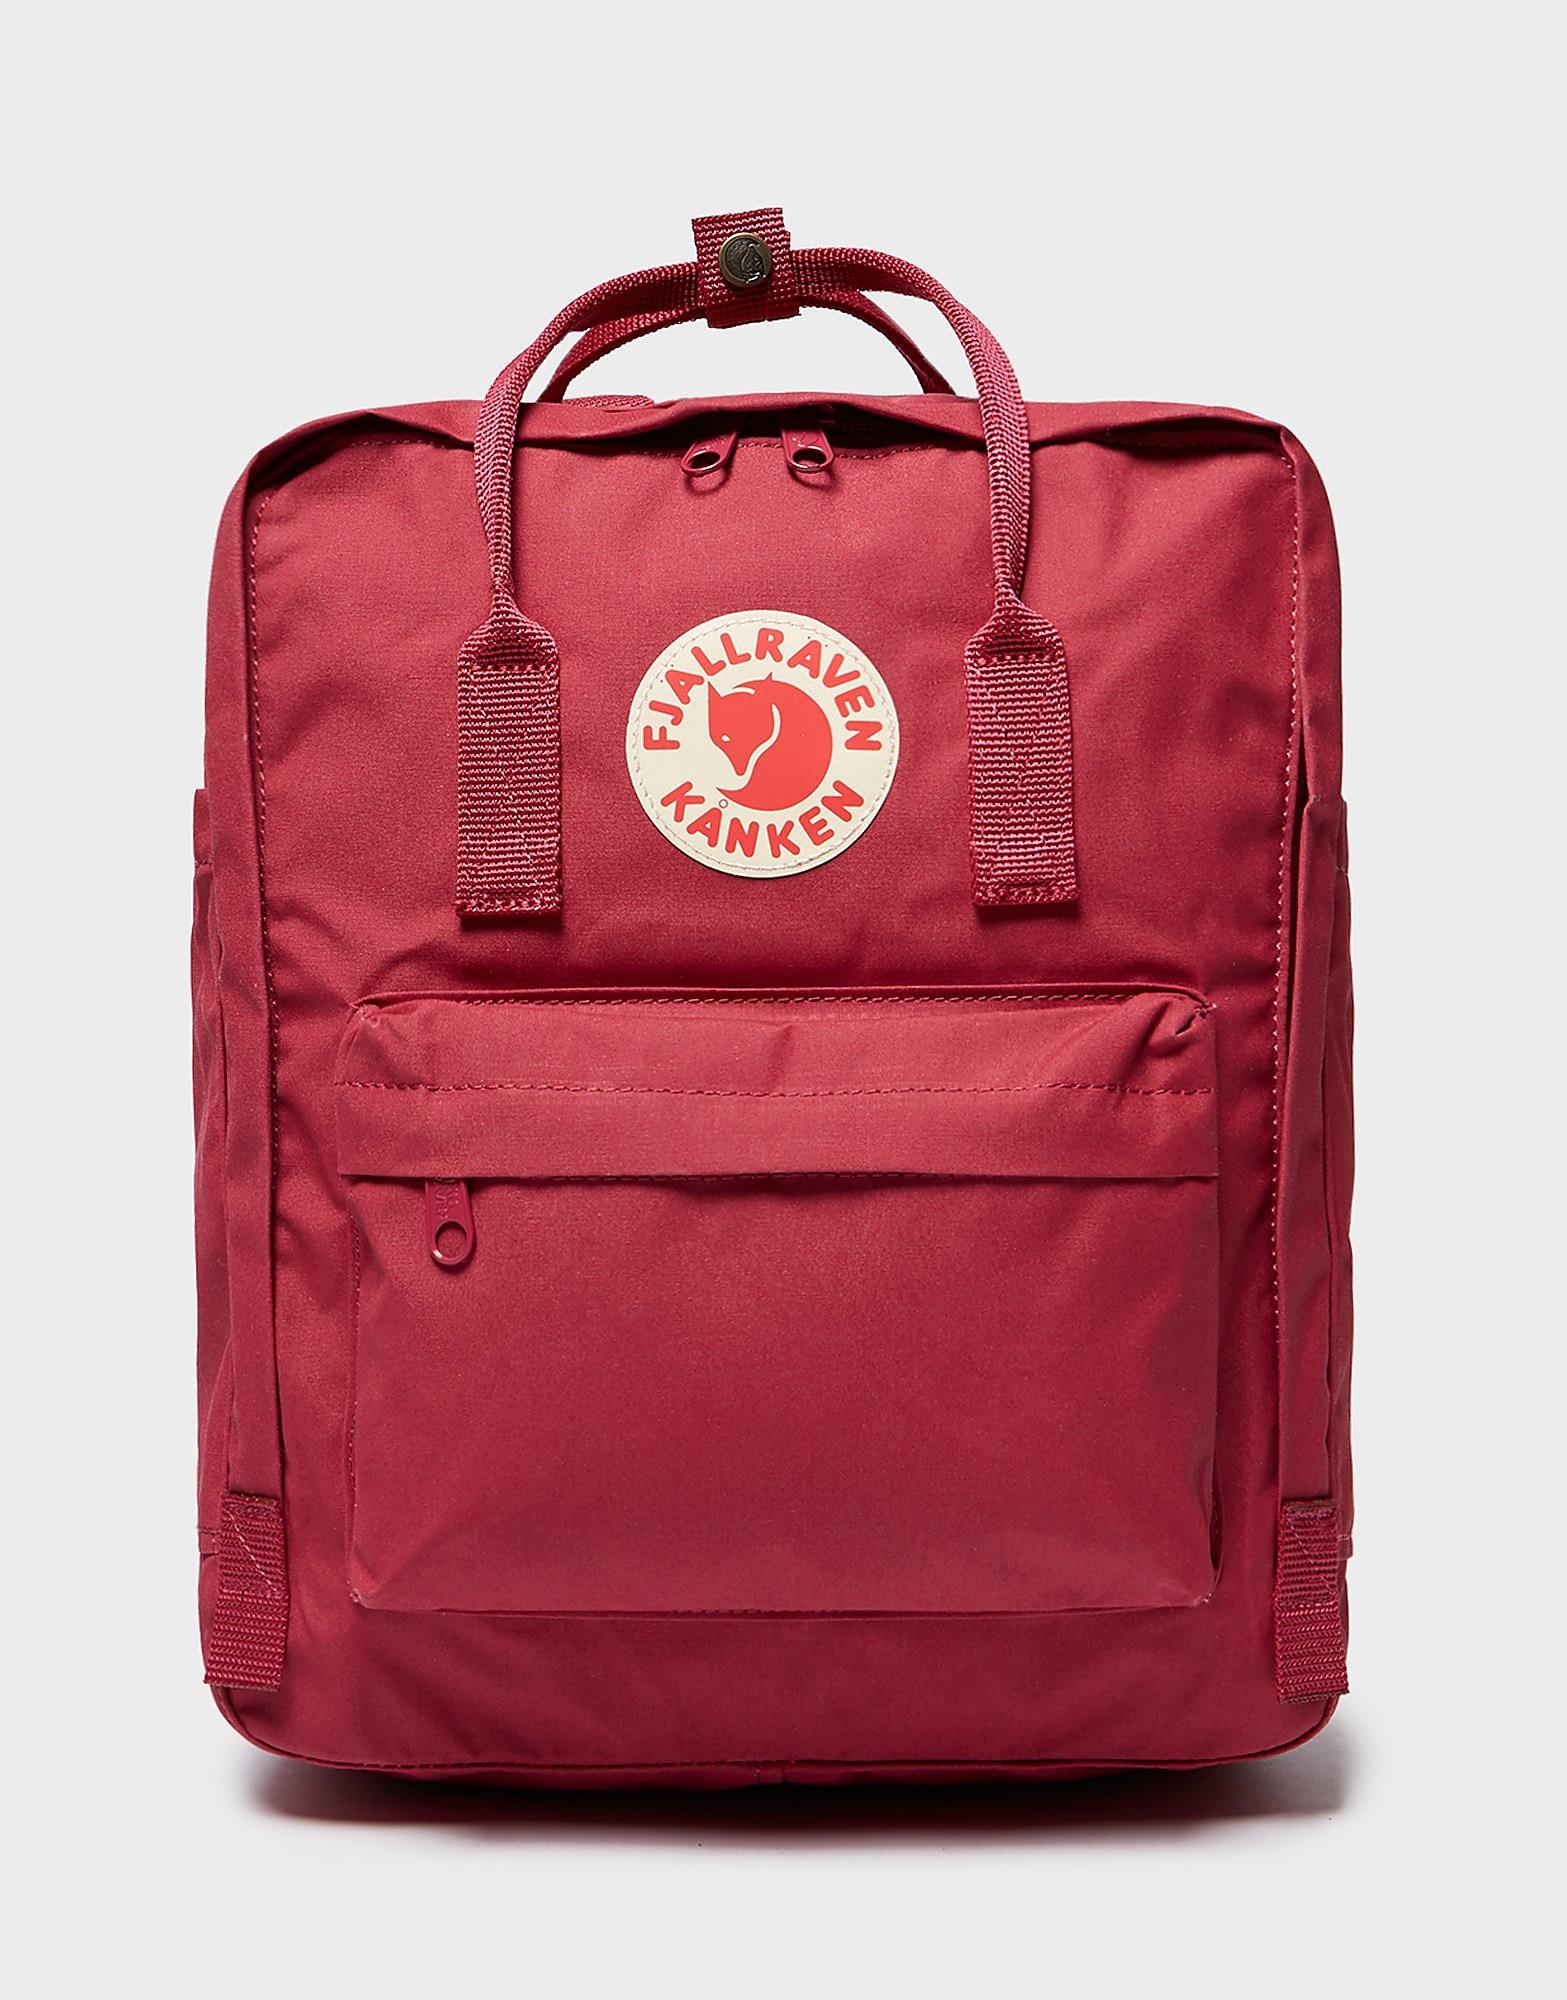 Fjallraven Kanken Backpack - Plum/Plum, Plum/Plum